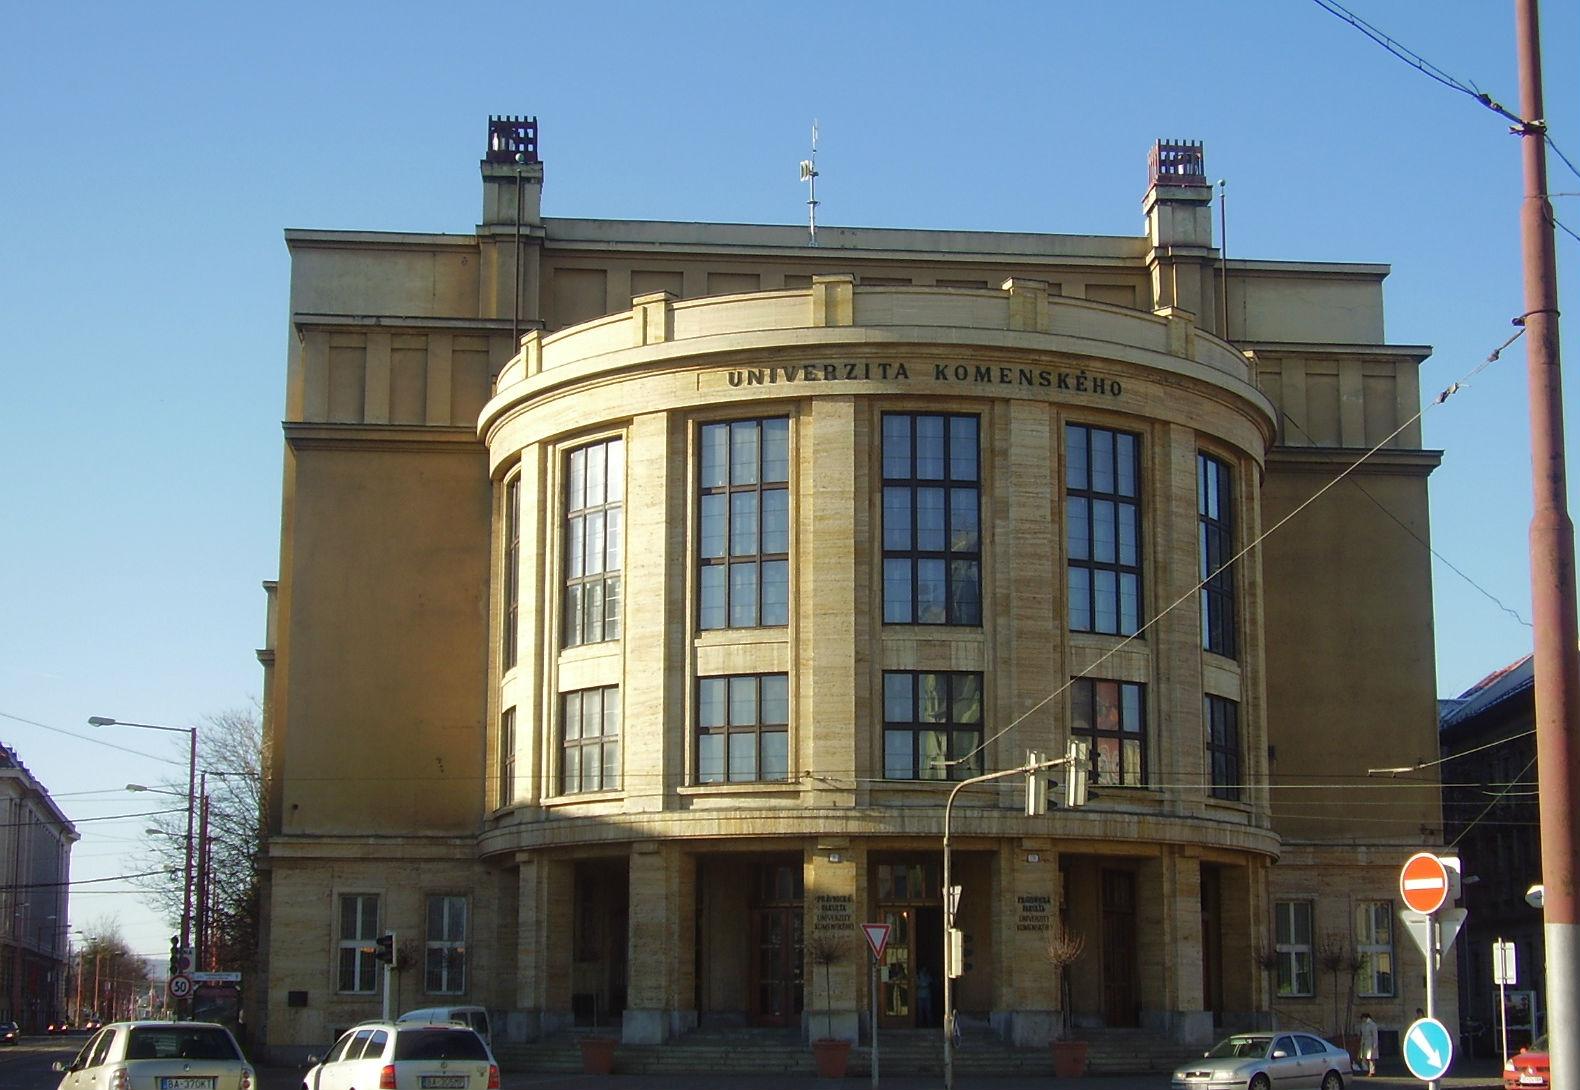 Univerzita_Komenskeho